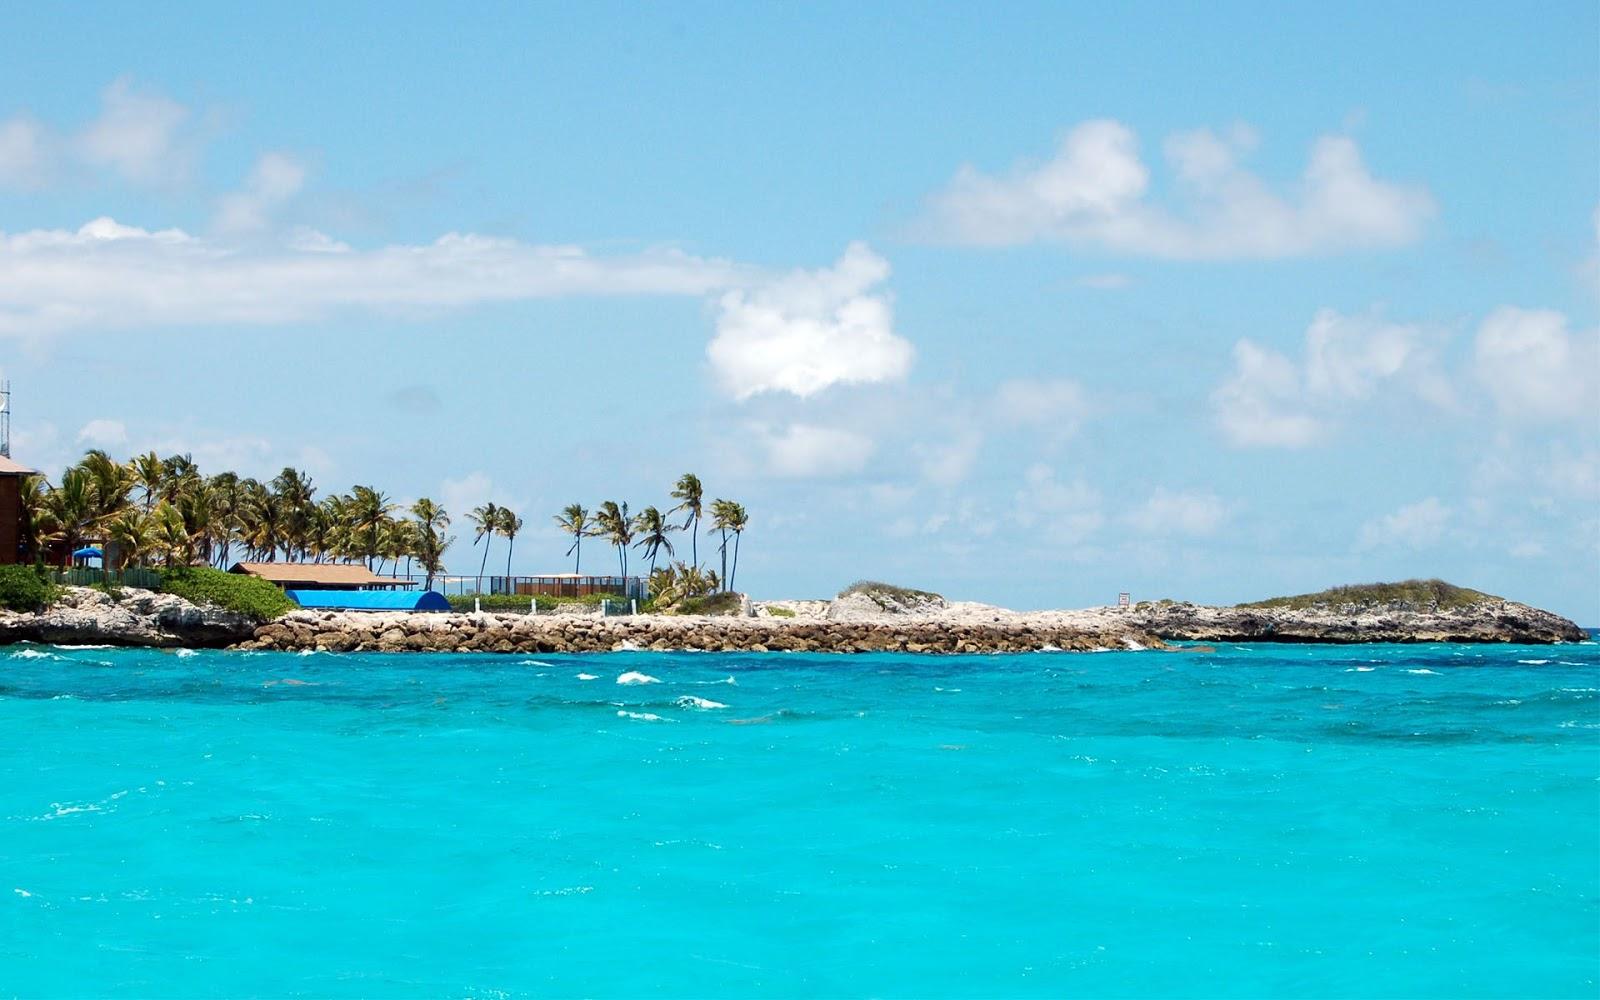 Tourism: Blue Lagoon Island